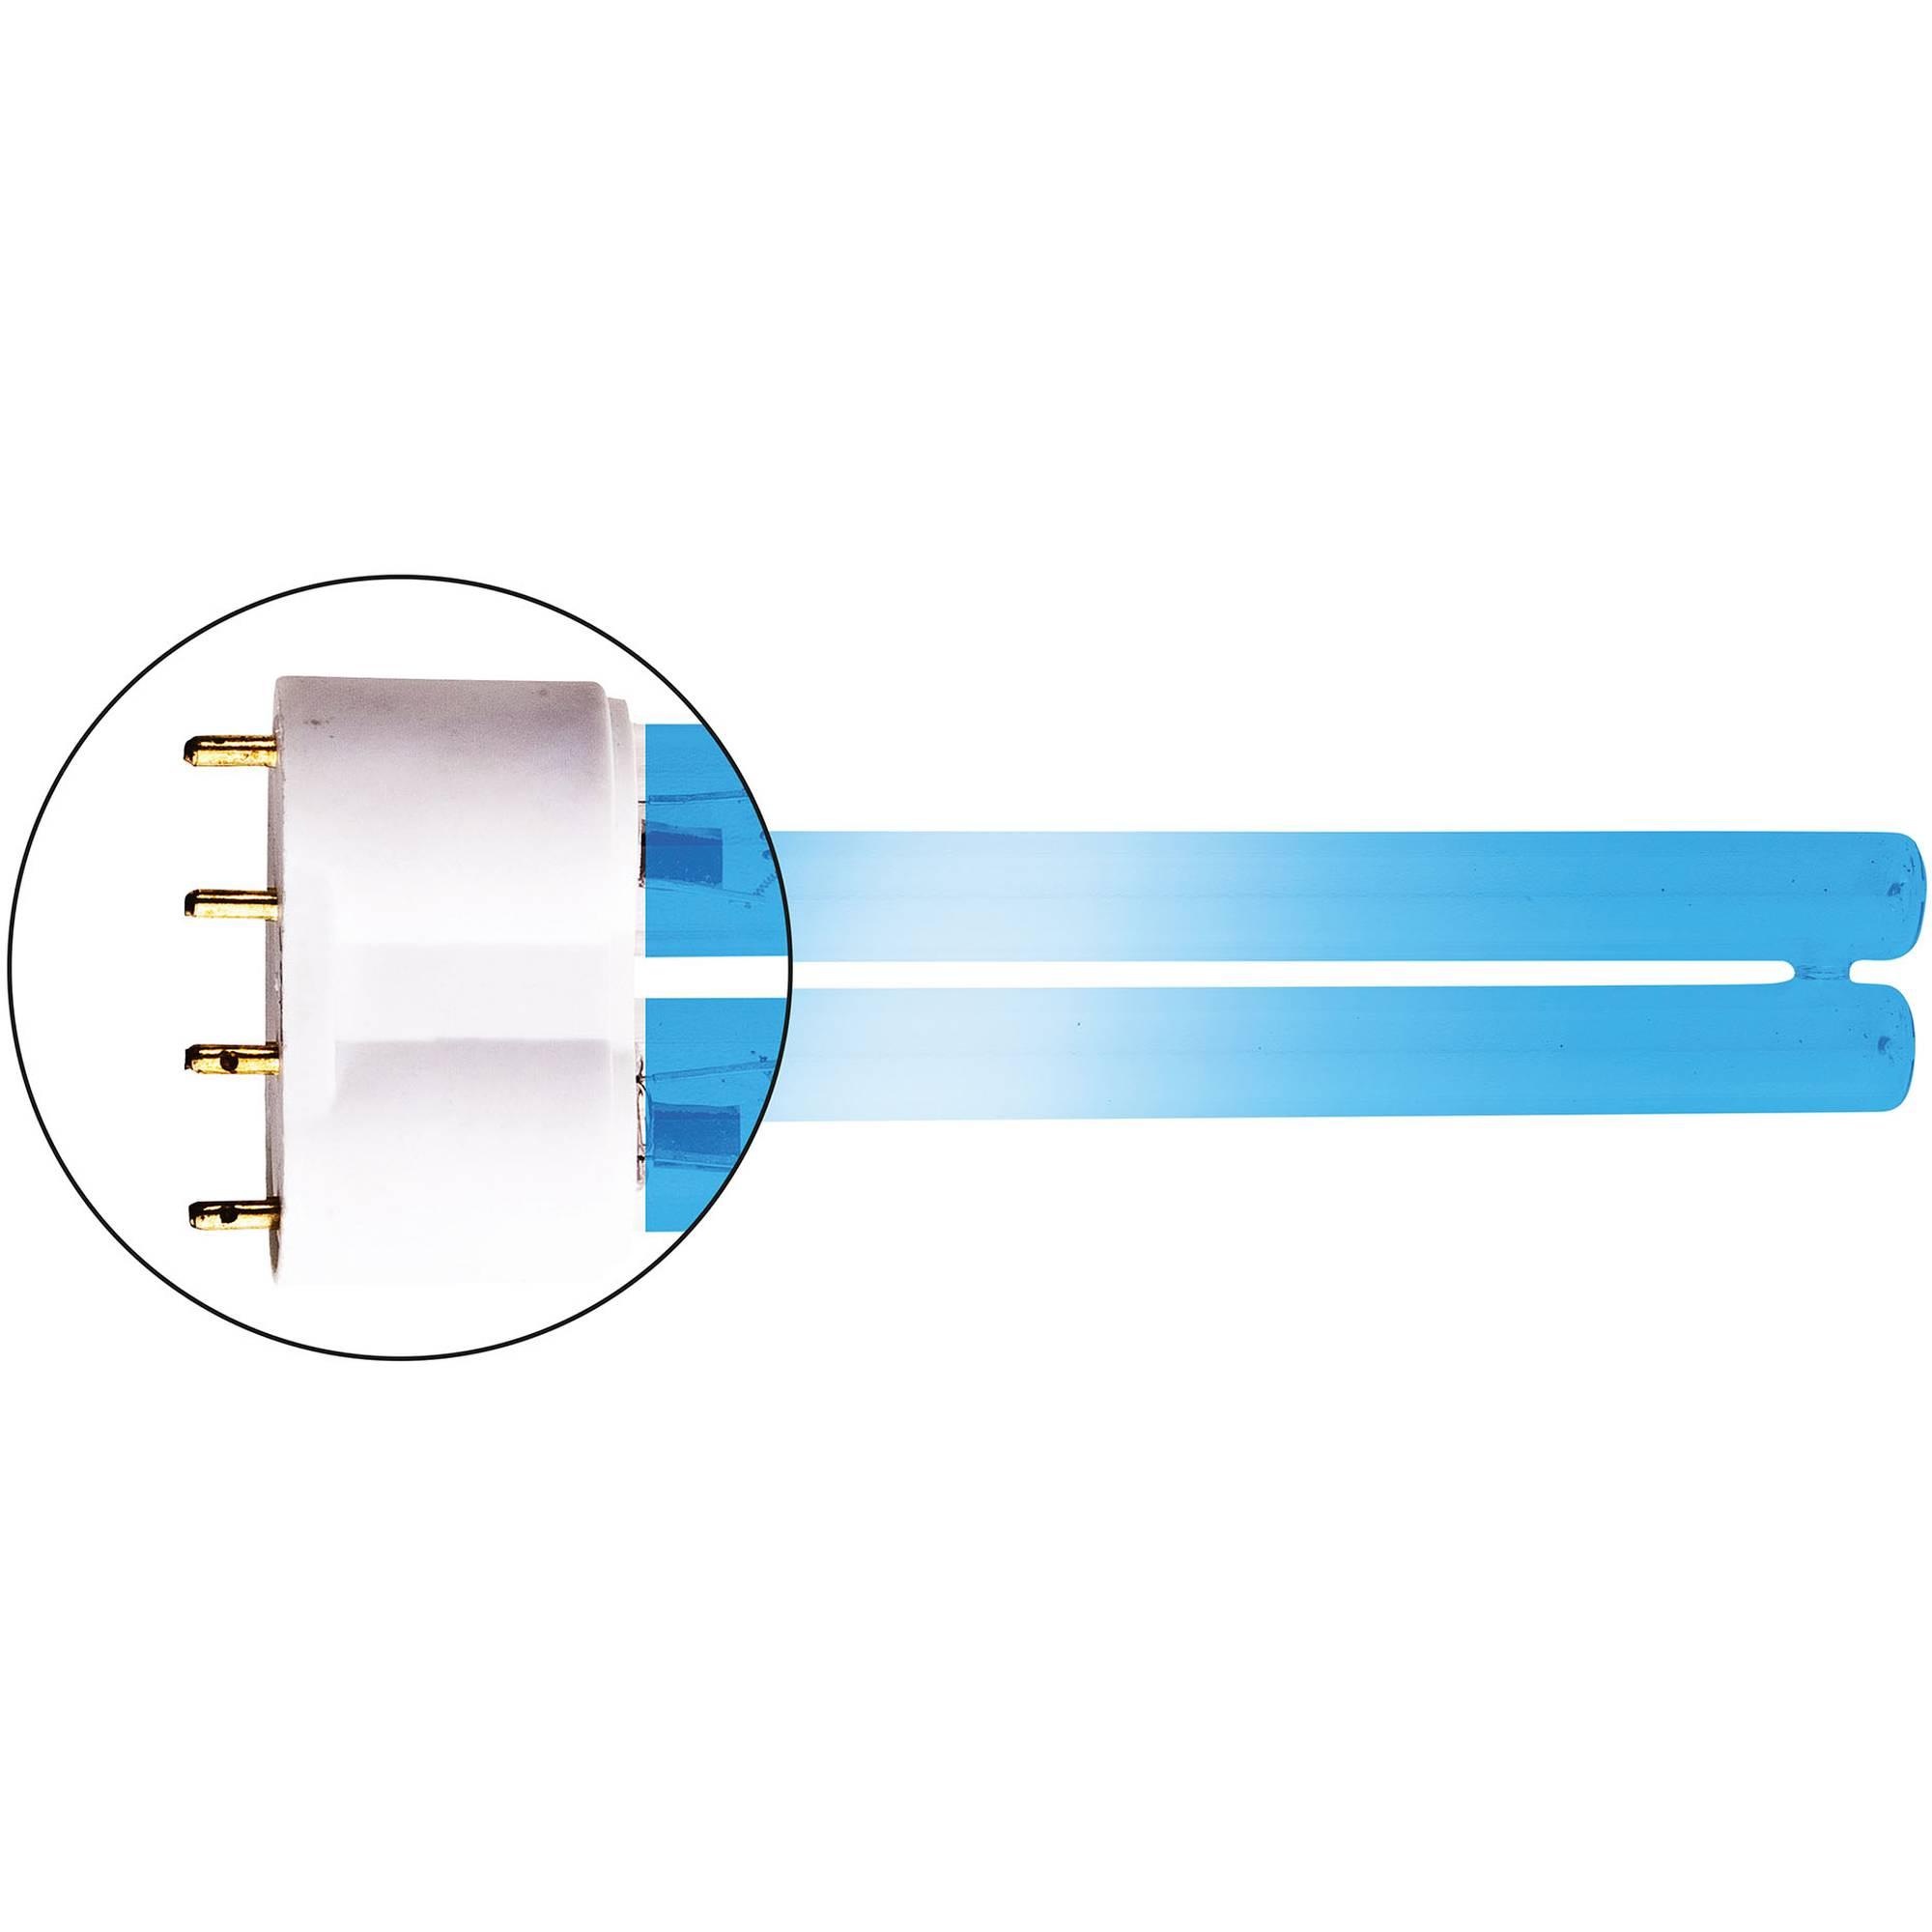 UVC Ersatzlampe 24 Watt Sockel PL-L 2G11 Austauschlampe